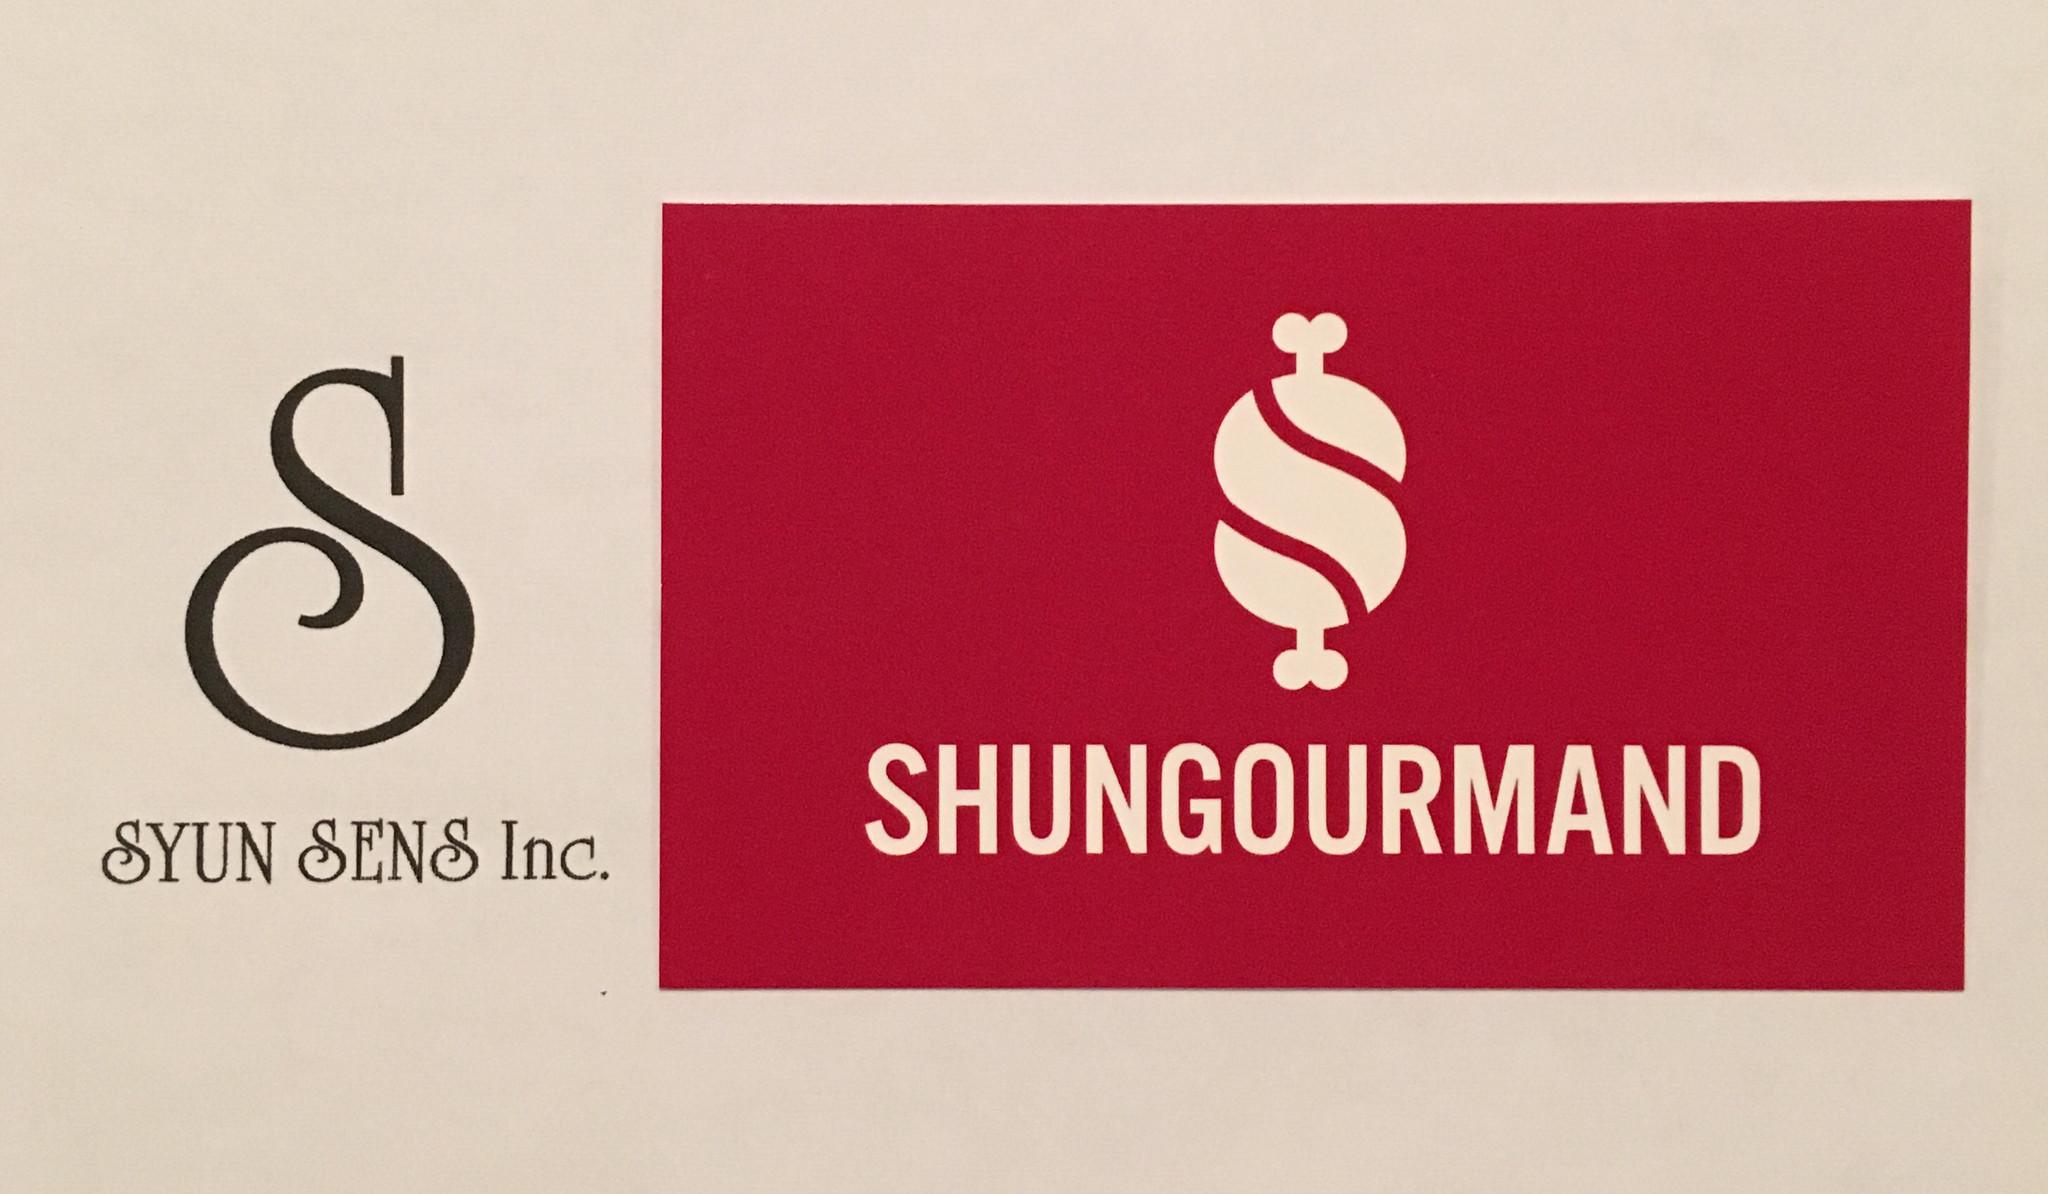 SHUNGOURMAND